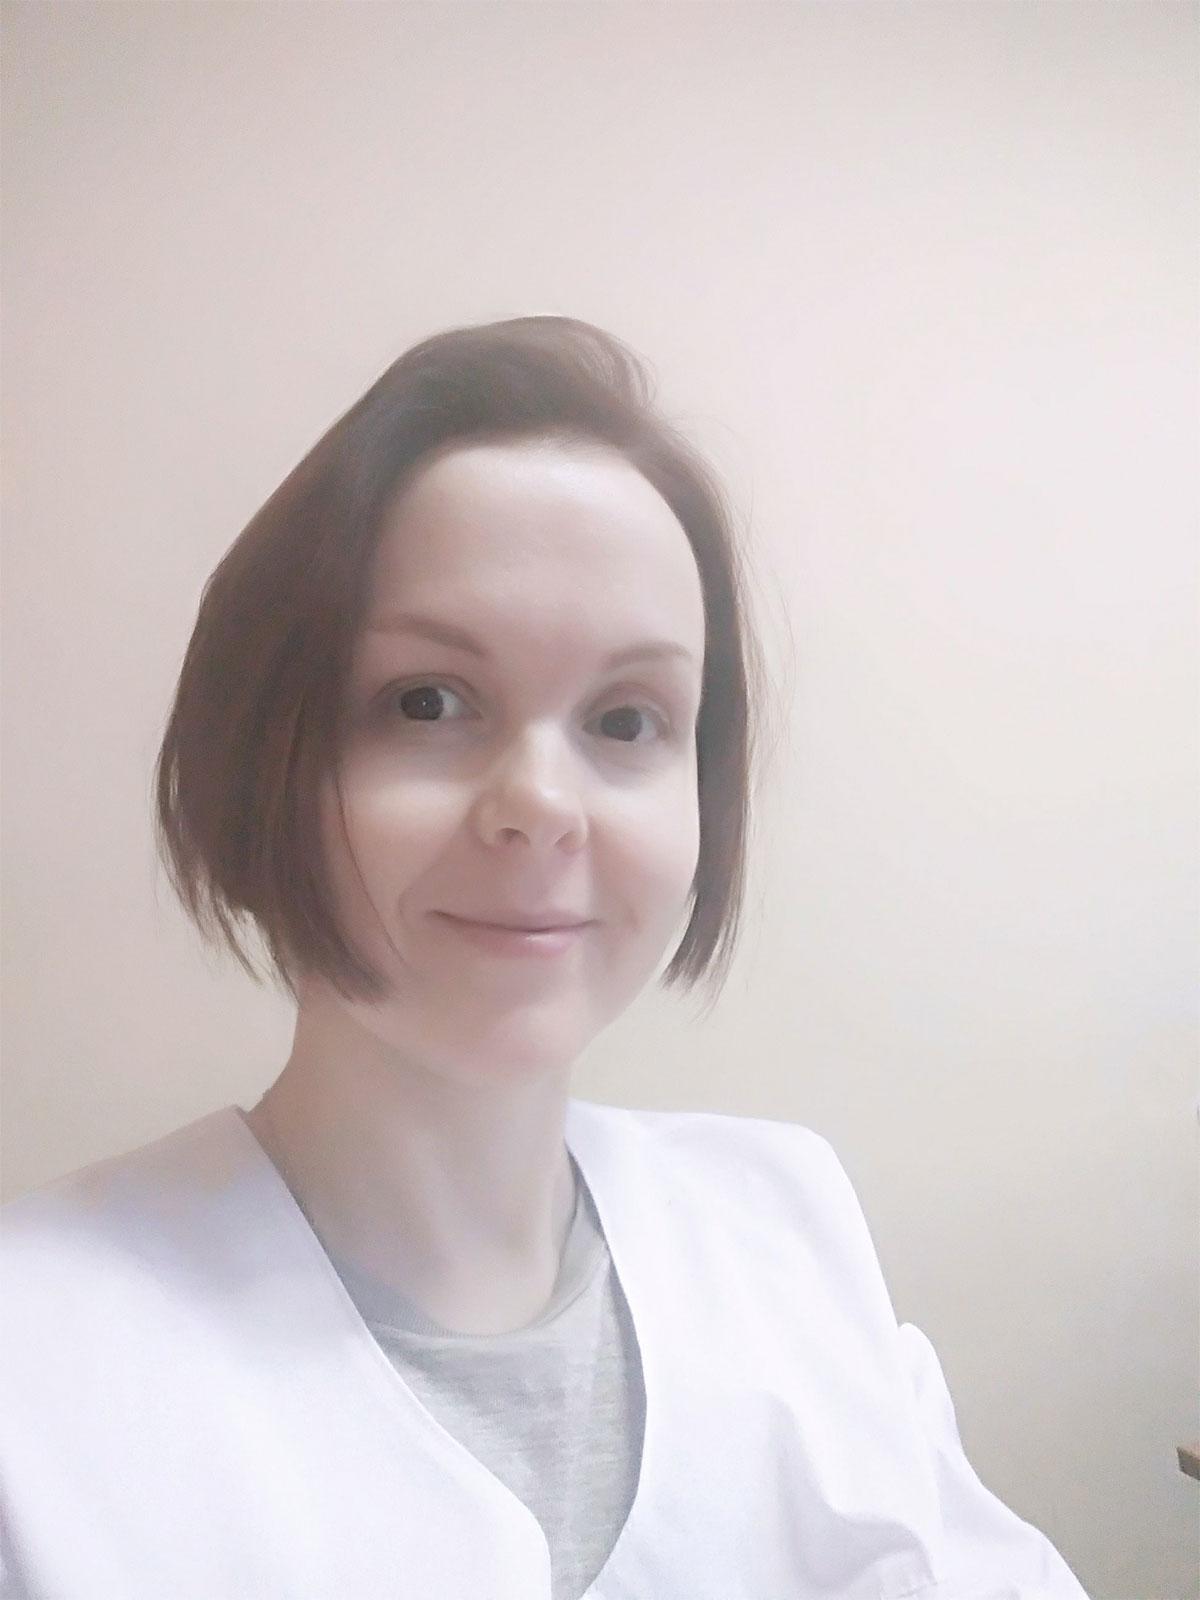 Чуракина Елена Михайловна – врач-эндокринолог